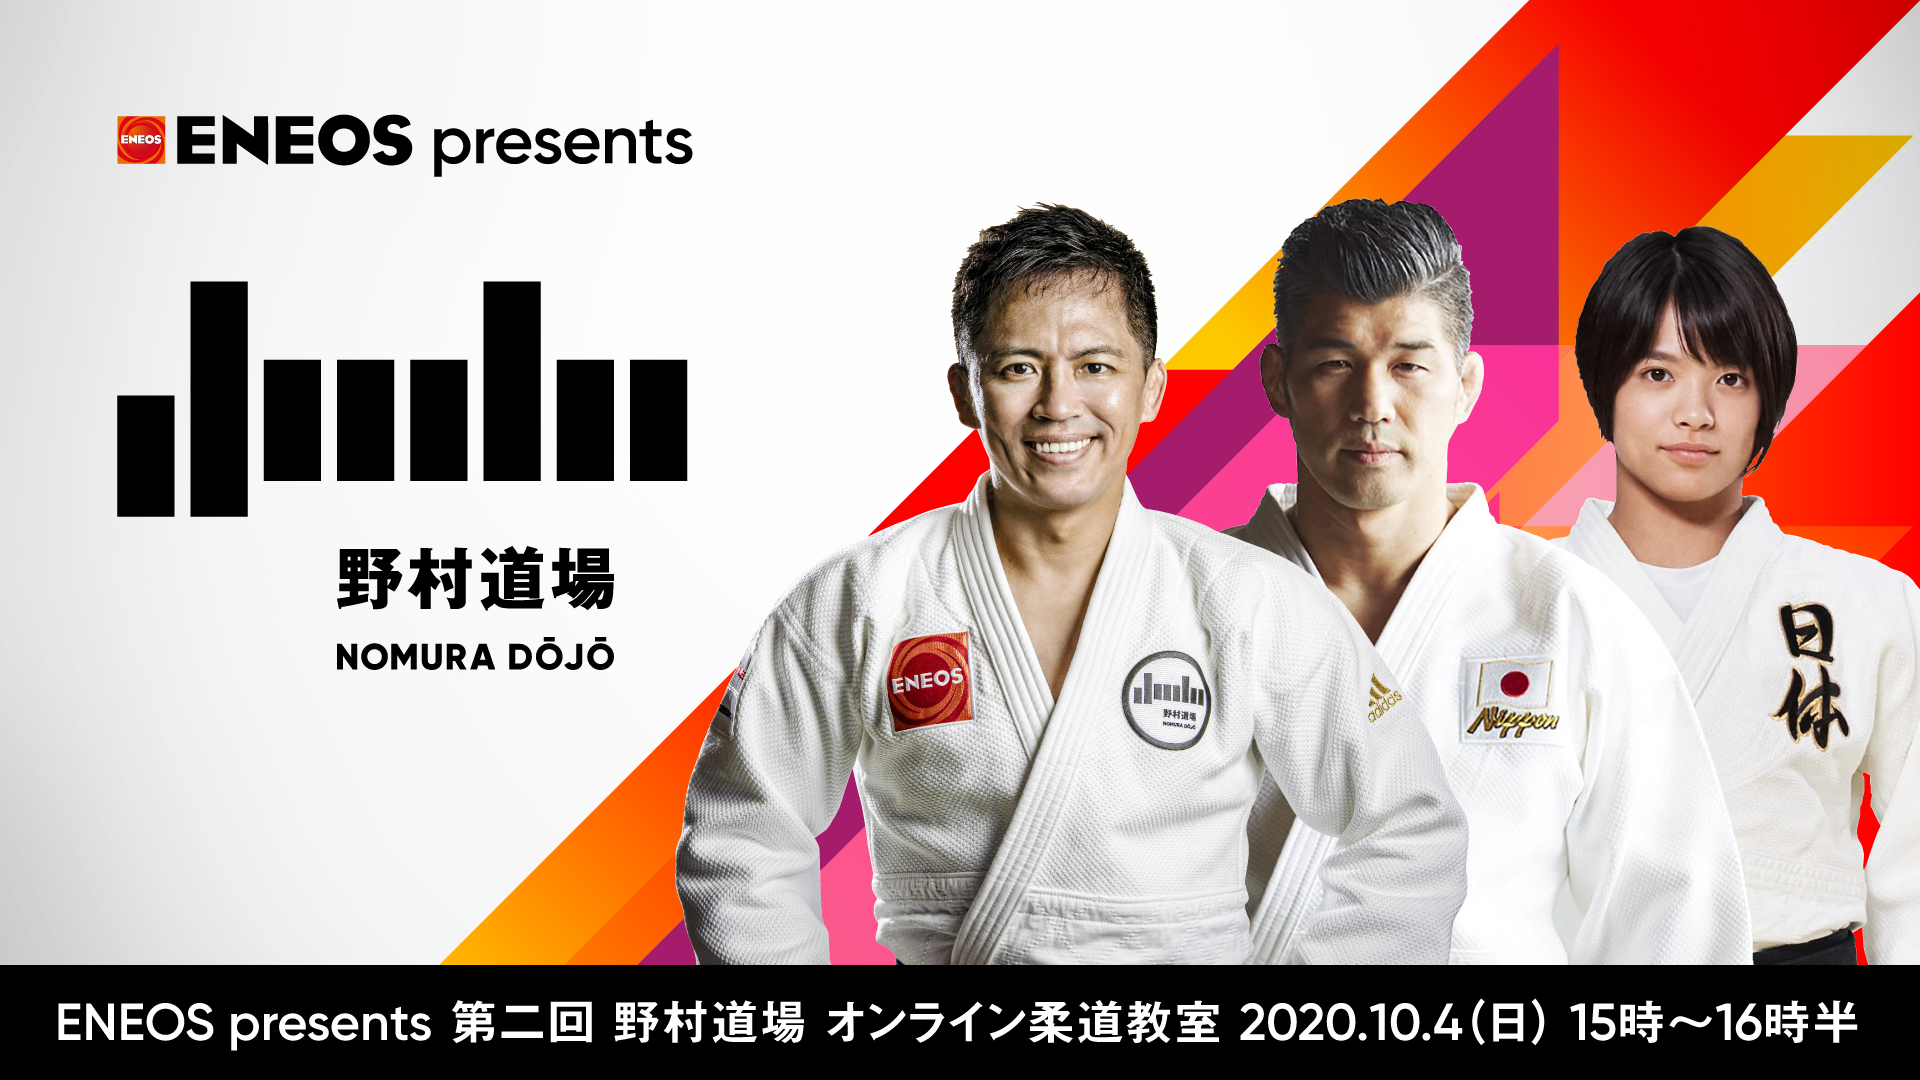 ENEOS presents 第二回 野村道場 オンライン柔道教室 10月4日(日)開催